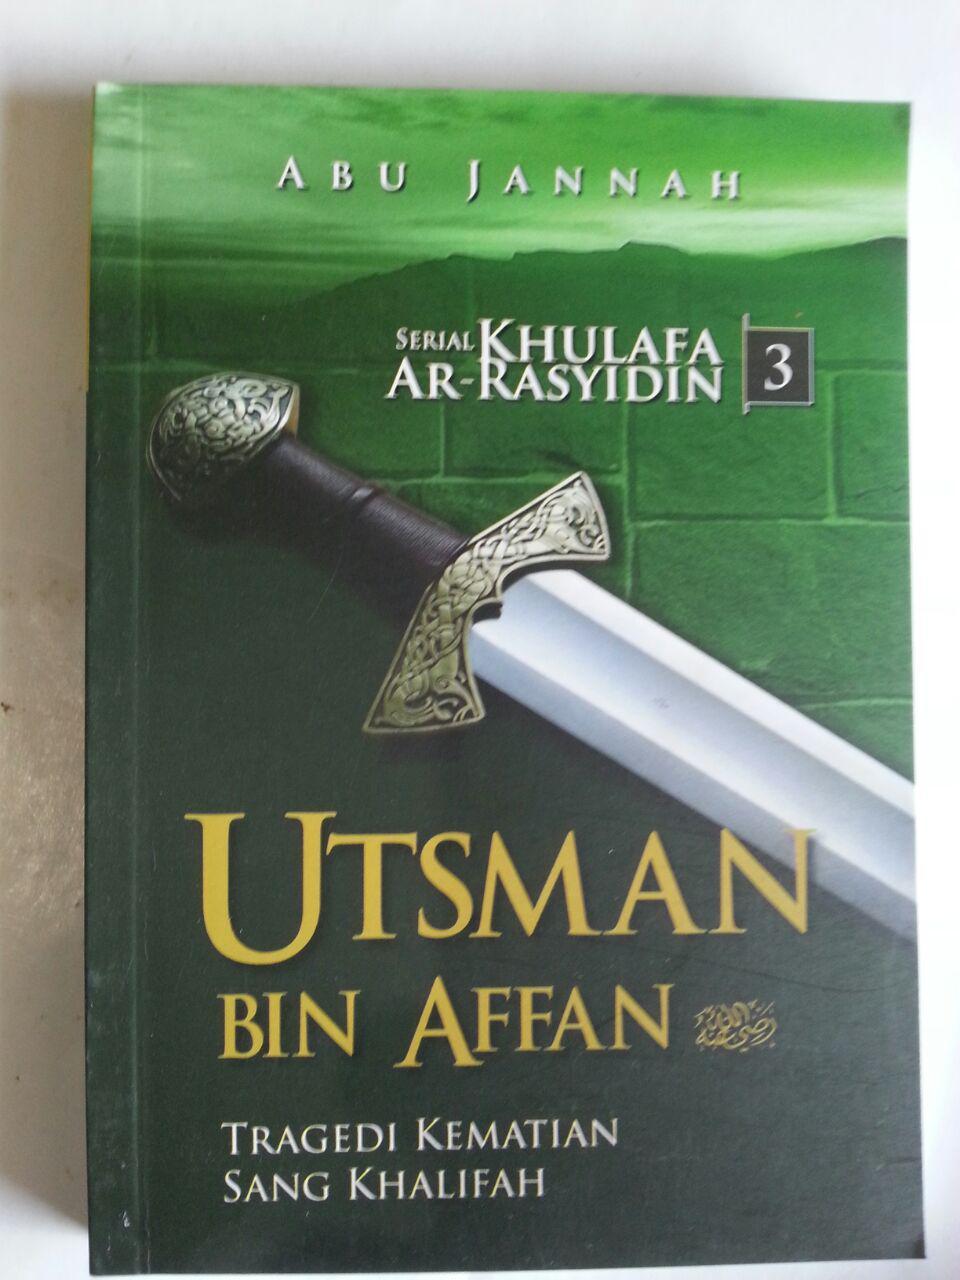 Buku Serial Khulafa Ar-Rasyidin 1 Set 4 Jilid cover 6